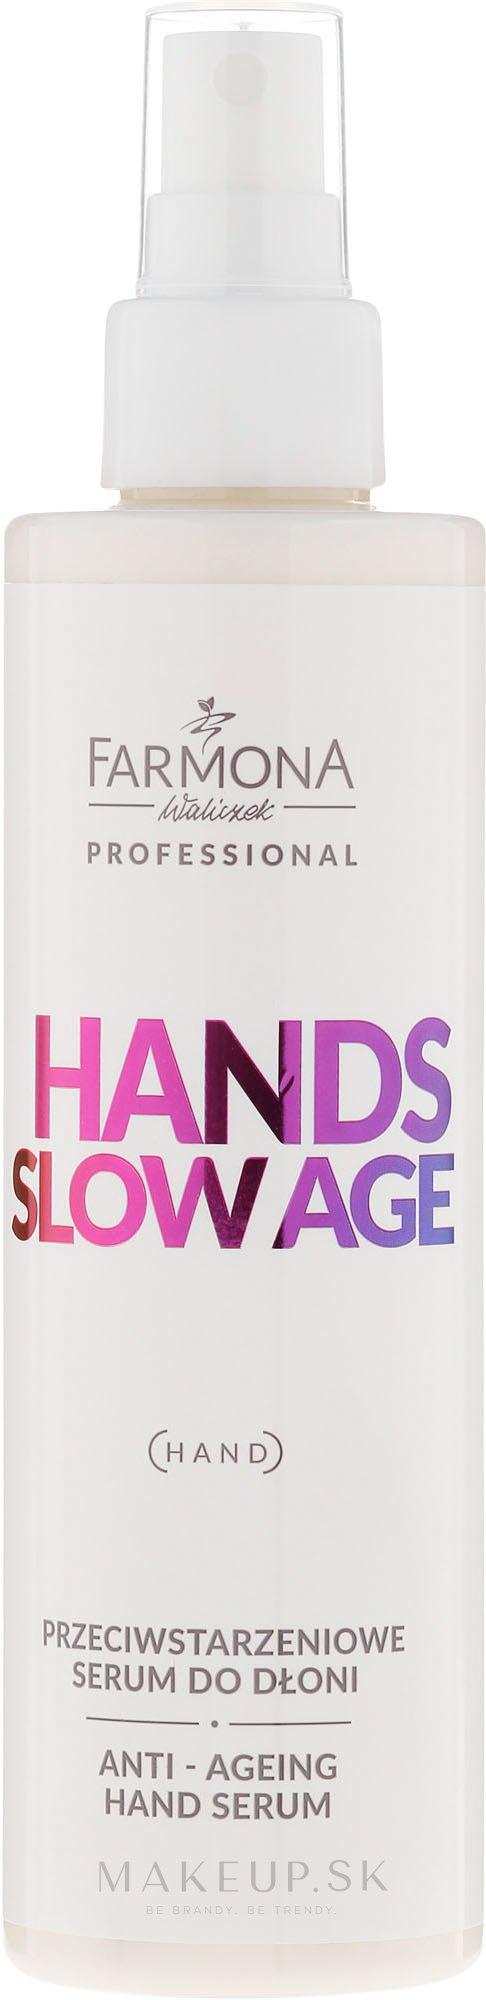 Sérum na ruky - Farmona Hands Slow Age Anti-ageing Hand Serum — Obrázky 200 ml